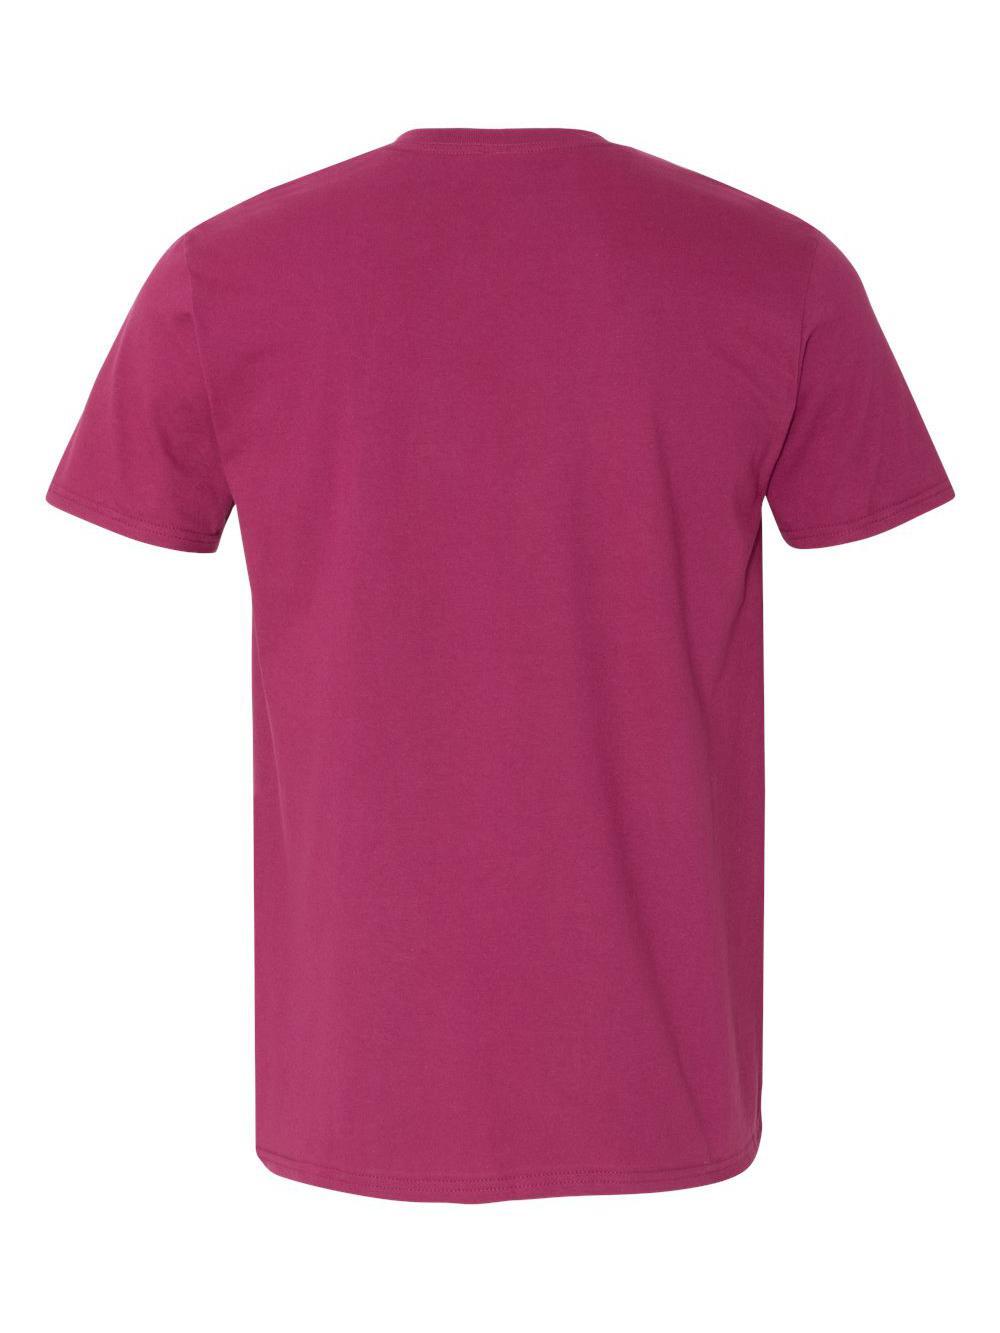 Gildan-Softstyle-T-Shirt-64000 thumbnail 16